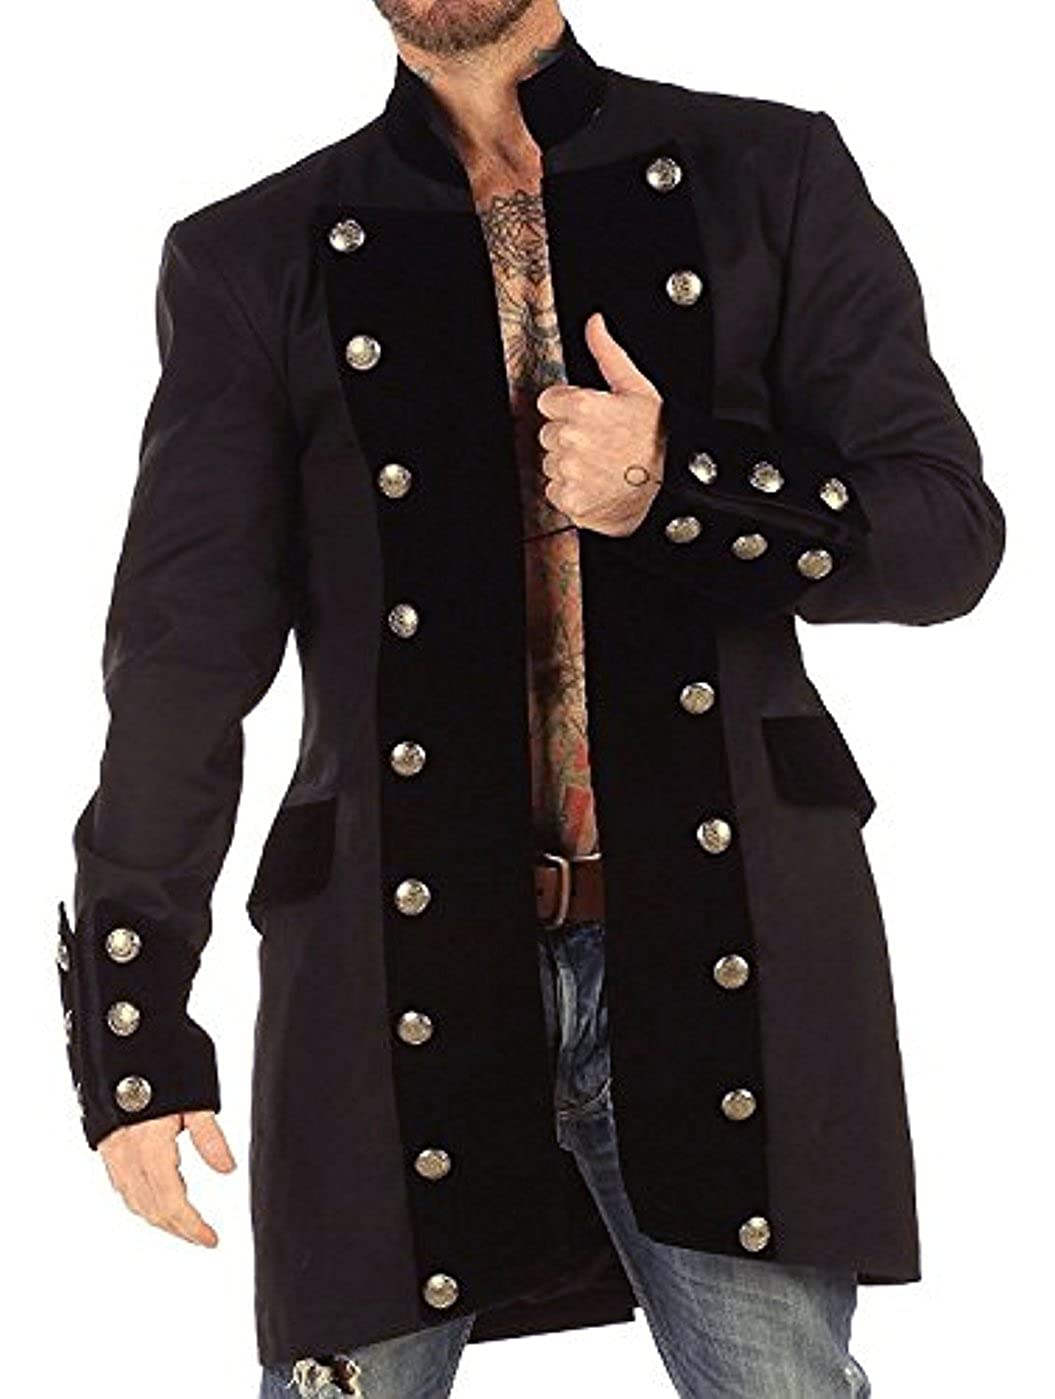 4bd000d1fe5 Men's Historical French Military Black Velvet Trim Charcoal Cotton Pirate  Coat - DeluxeAdultCostumes.com